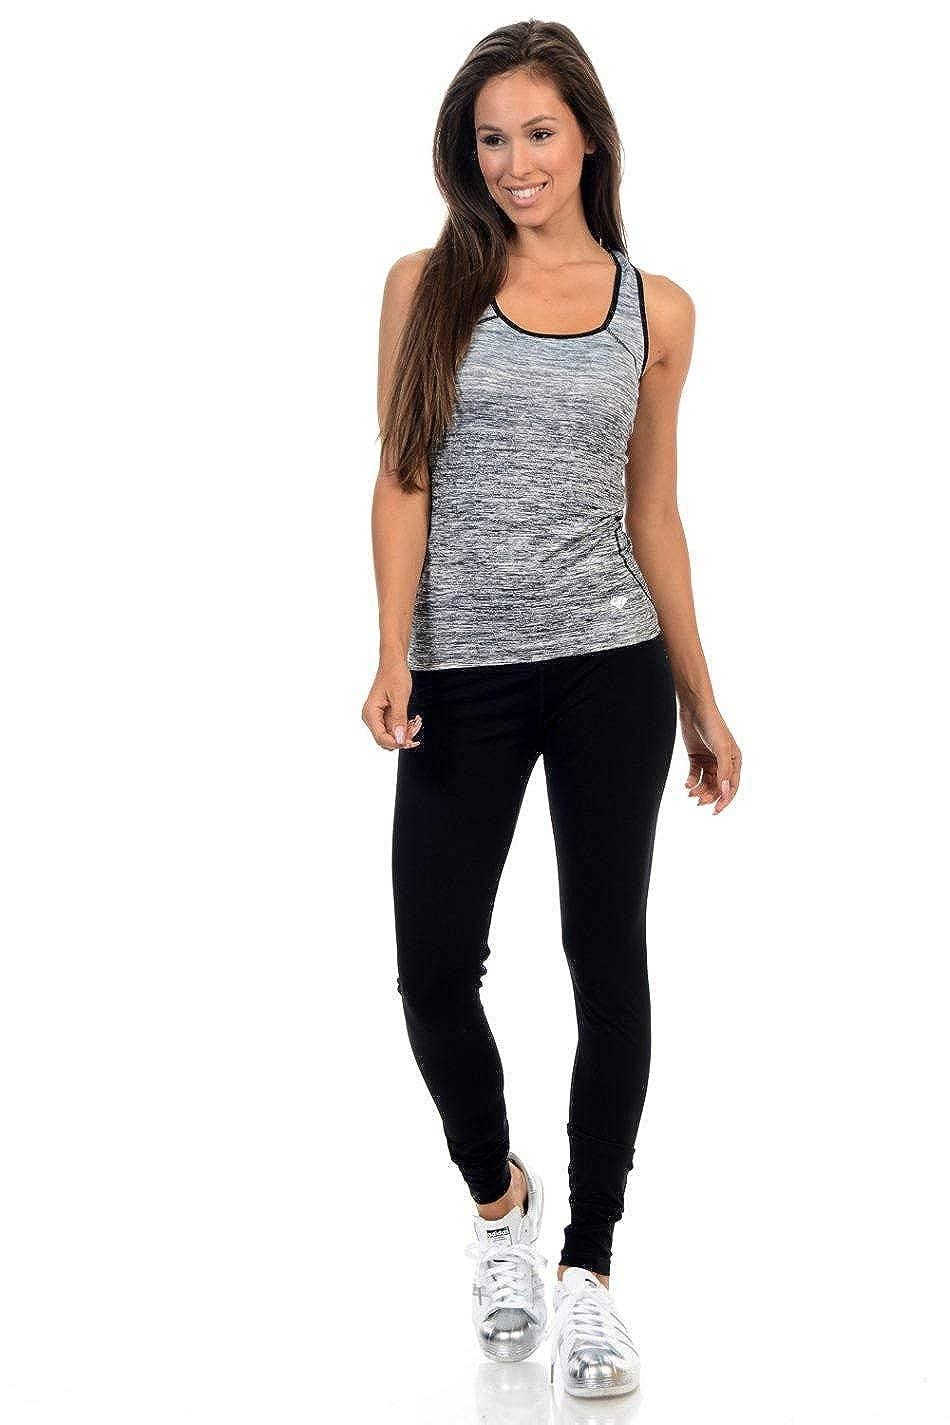 Style ACDN002-2 Diamante Womens Yoga Top Sportswear